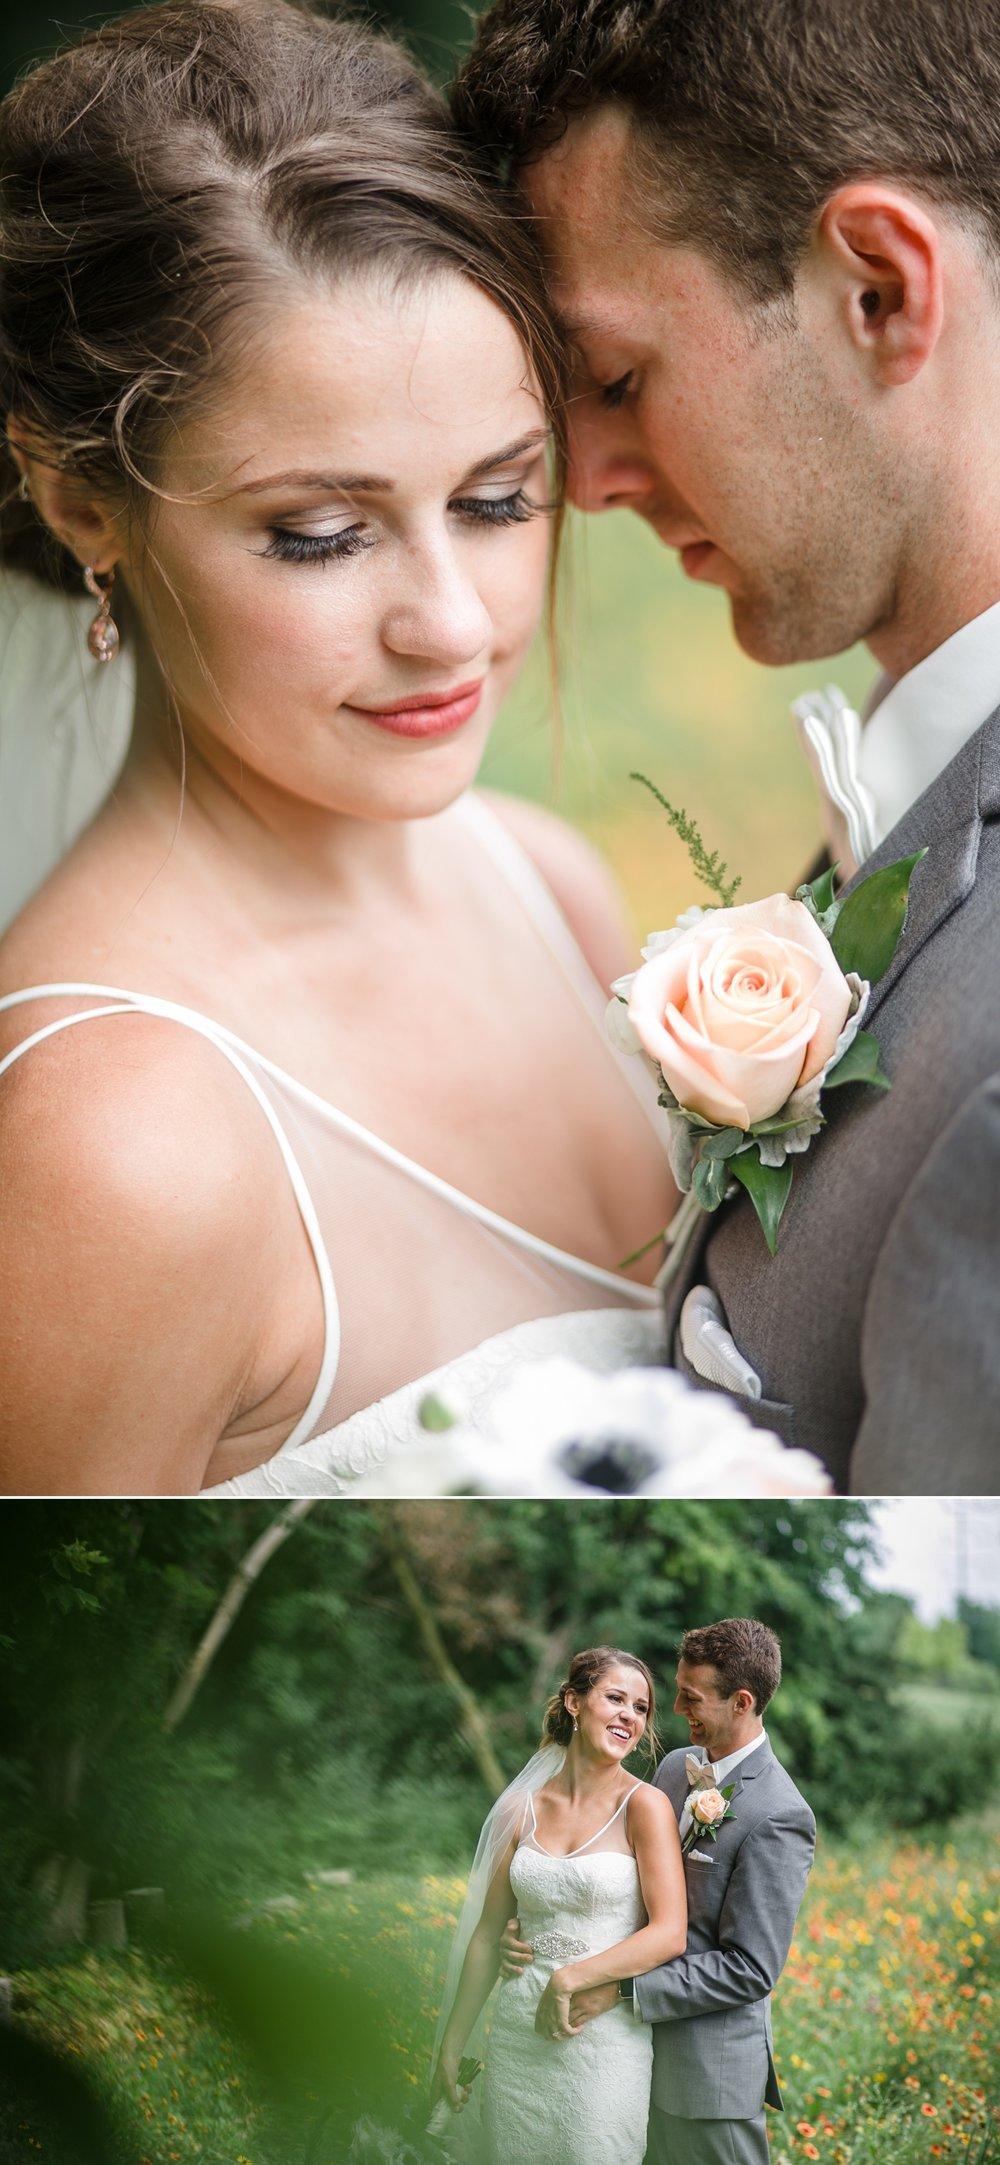 Highland-meadows-wedding-photos 7.jpg